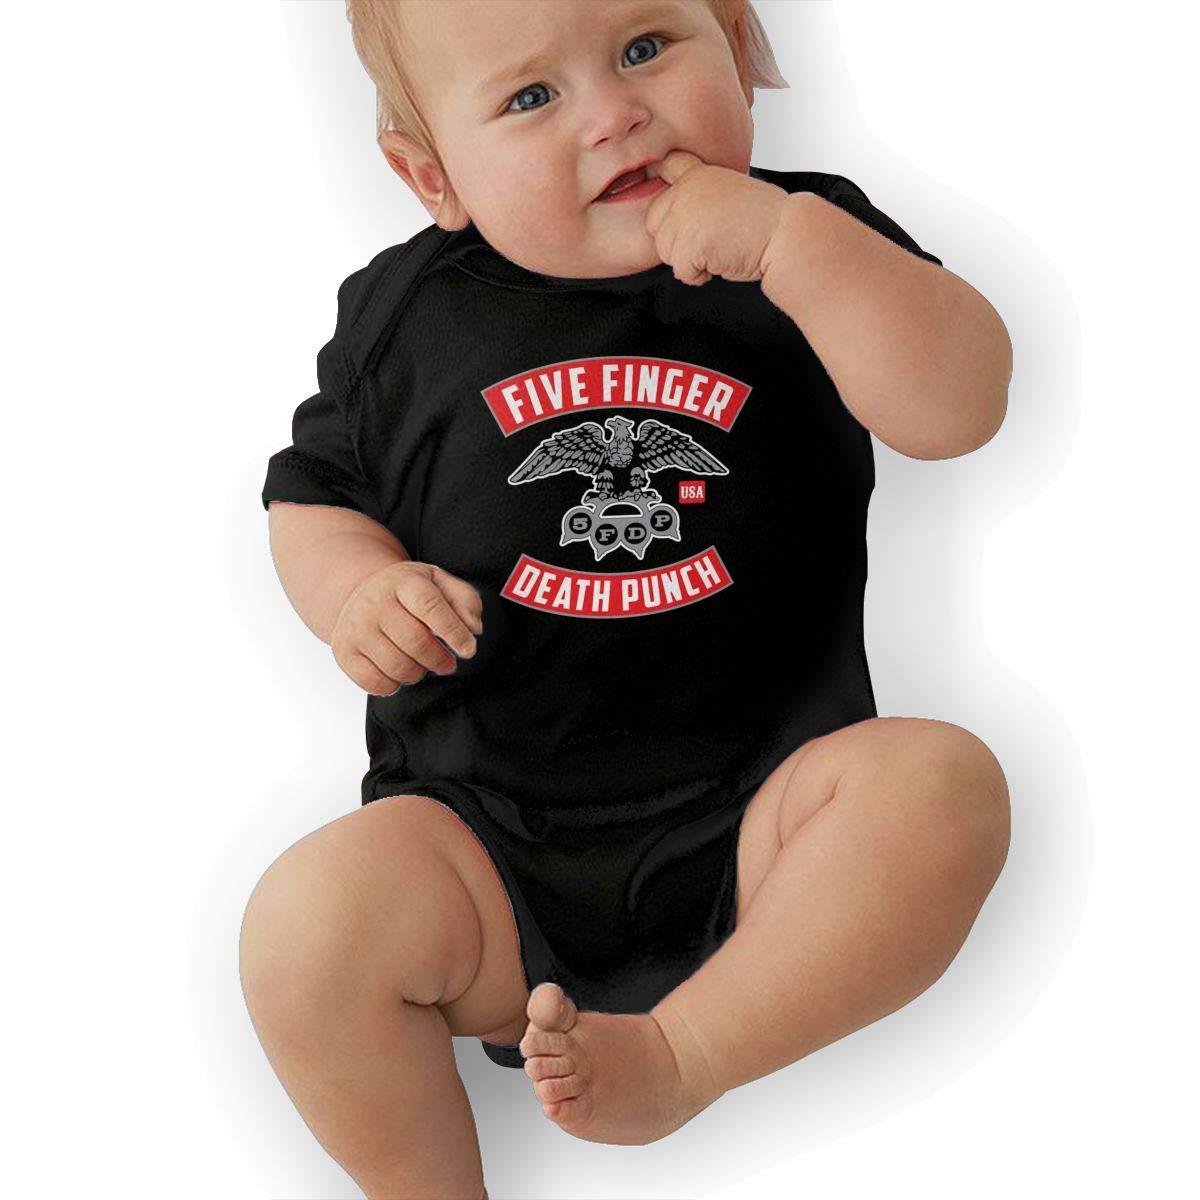 LuckyTagy Five Finger Death Punch Unisex Fashion Newborn Baby Romper Baby GirlPlay Suit Black